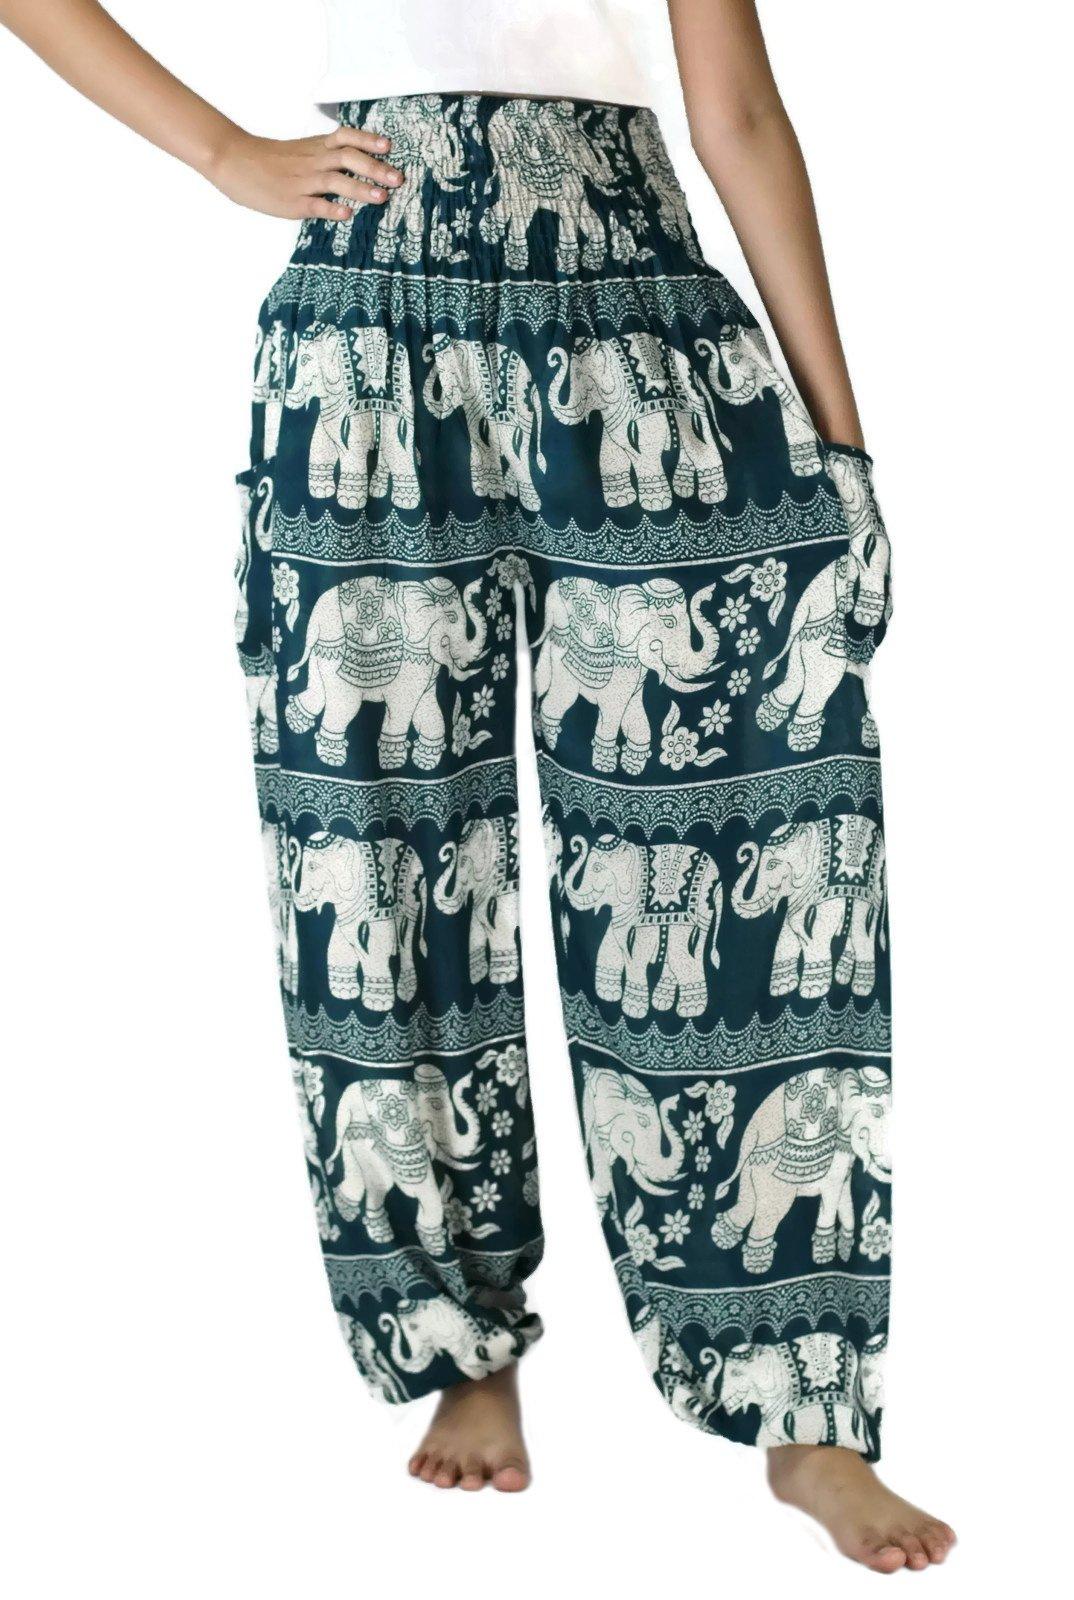 NaLuck Harem Pants Women's Hippie Bohemian Boho Smocked Waist Elephant floral prints Aladdin Yoga Casual Pants PJ16-Turquoise#2 by NaLuck